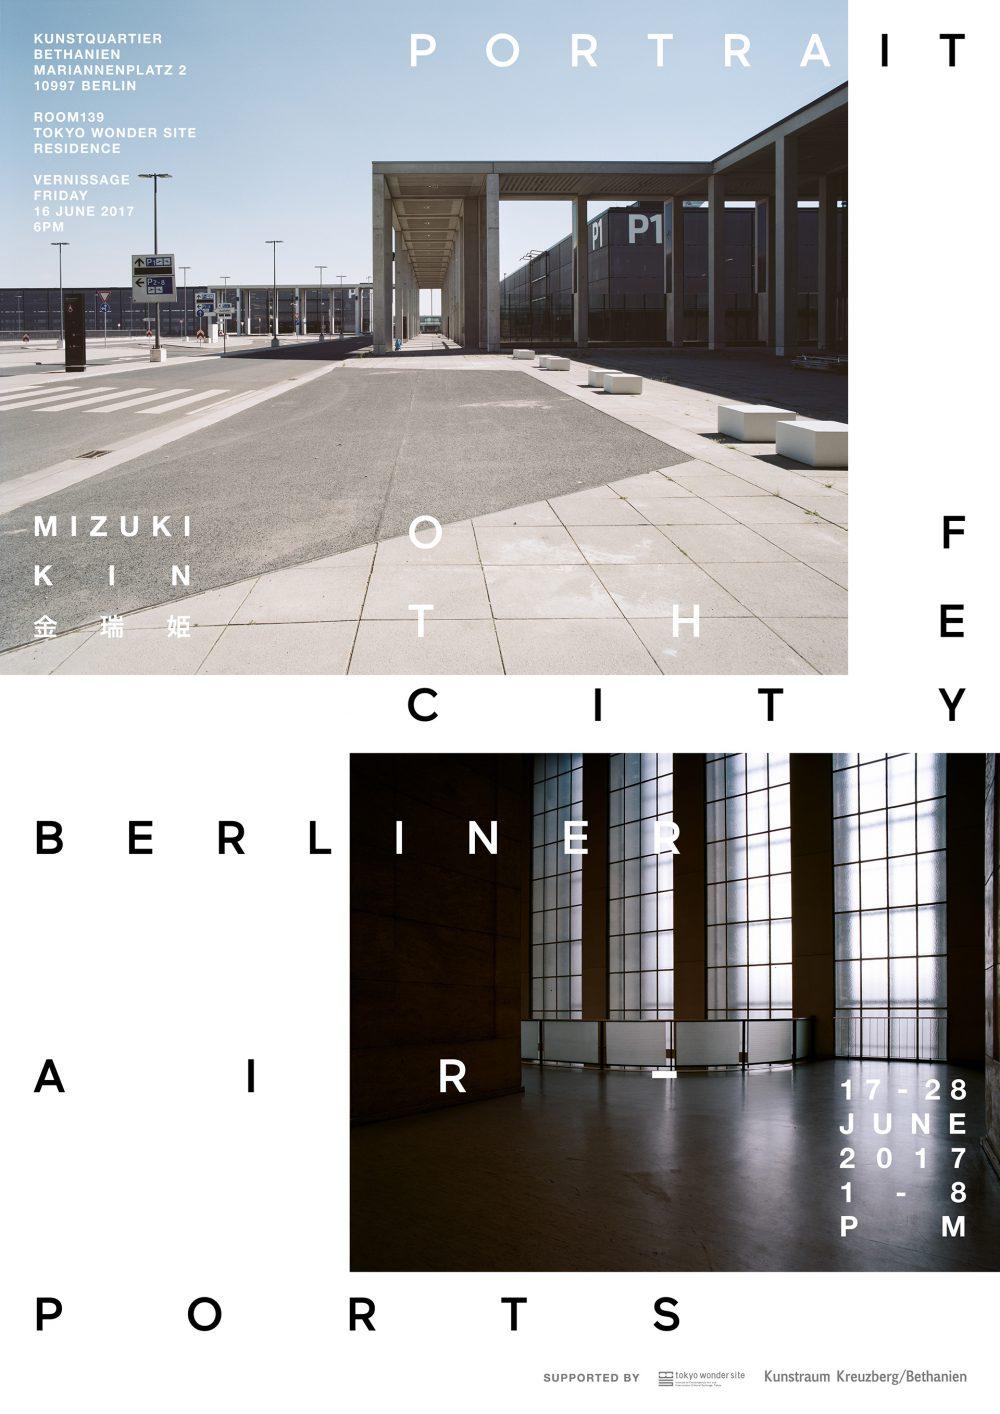 aiüo design Kin Mizuki Poster